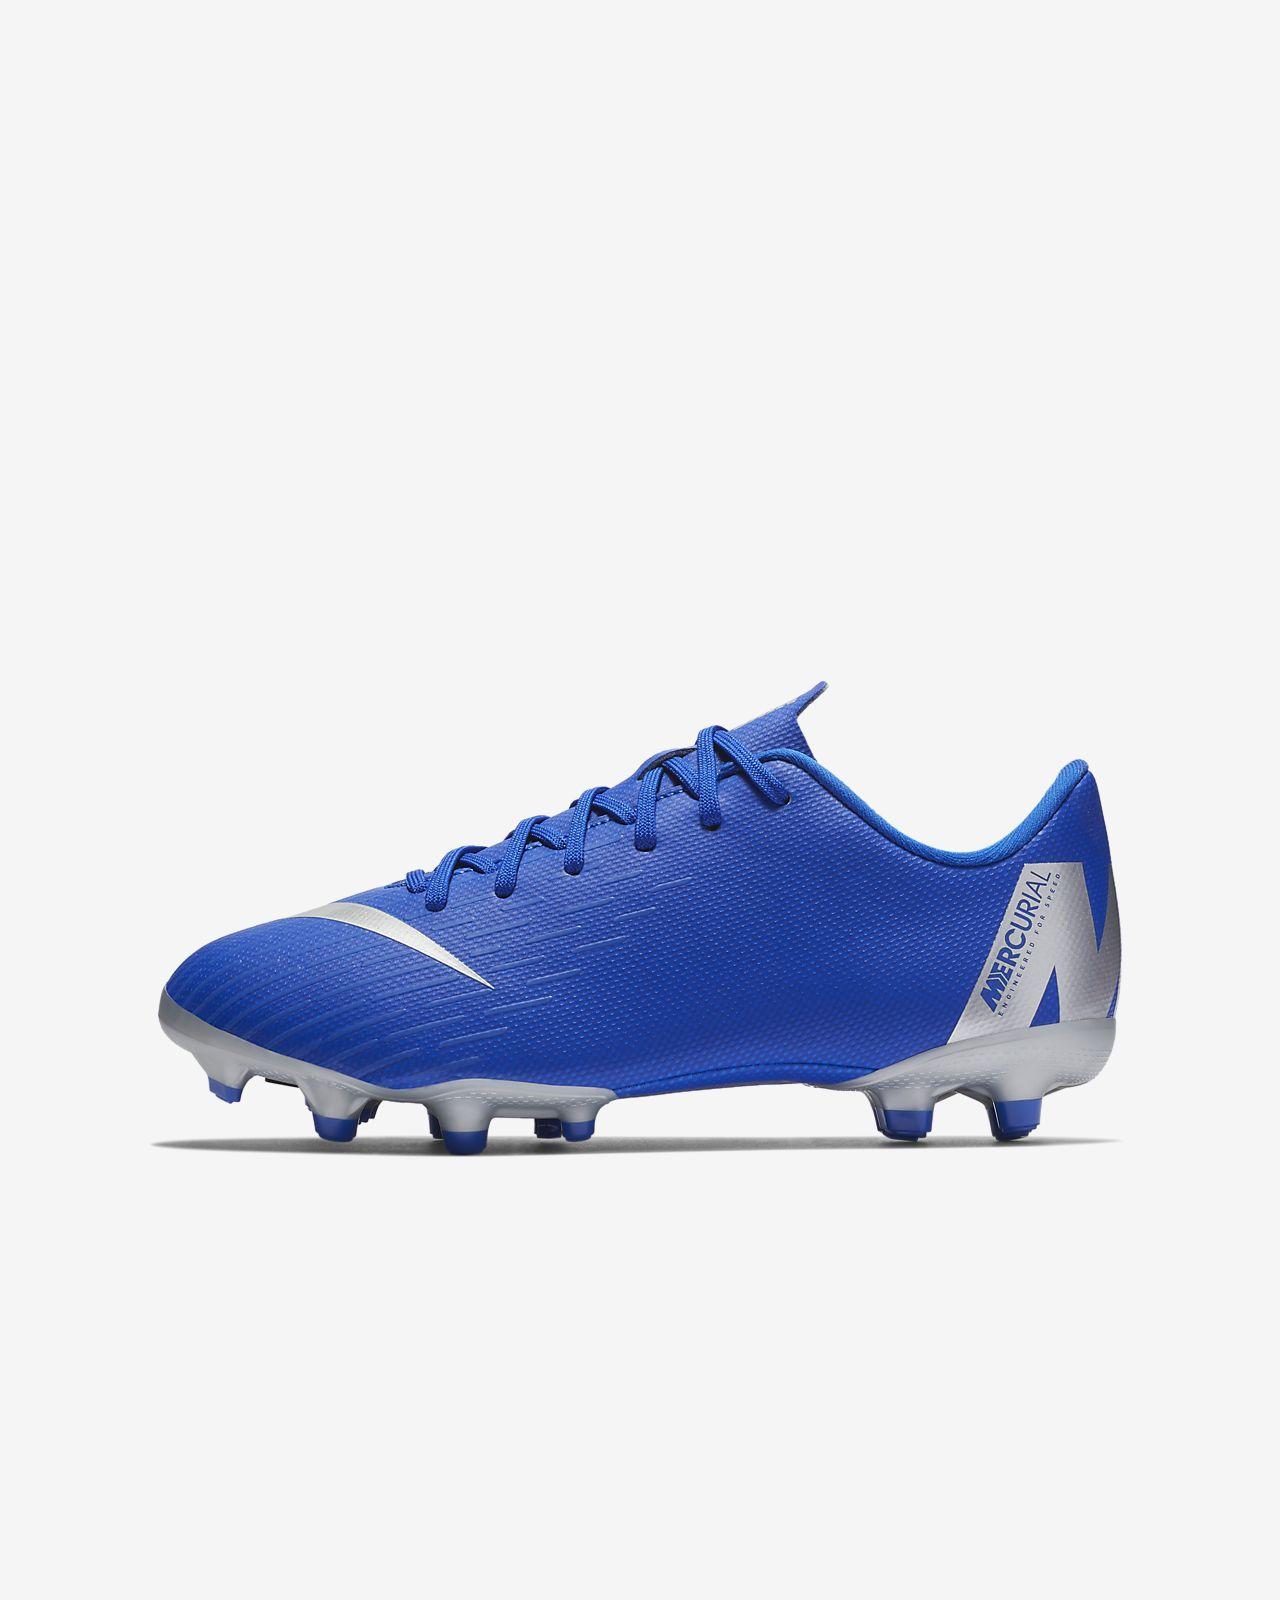 24729b4cf5 ... Chaussure de football multi-terrains à crampons Nike Jr. Mercurial  Vapor XII Academy pour